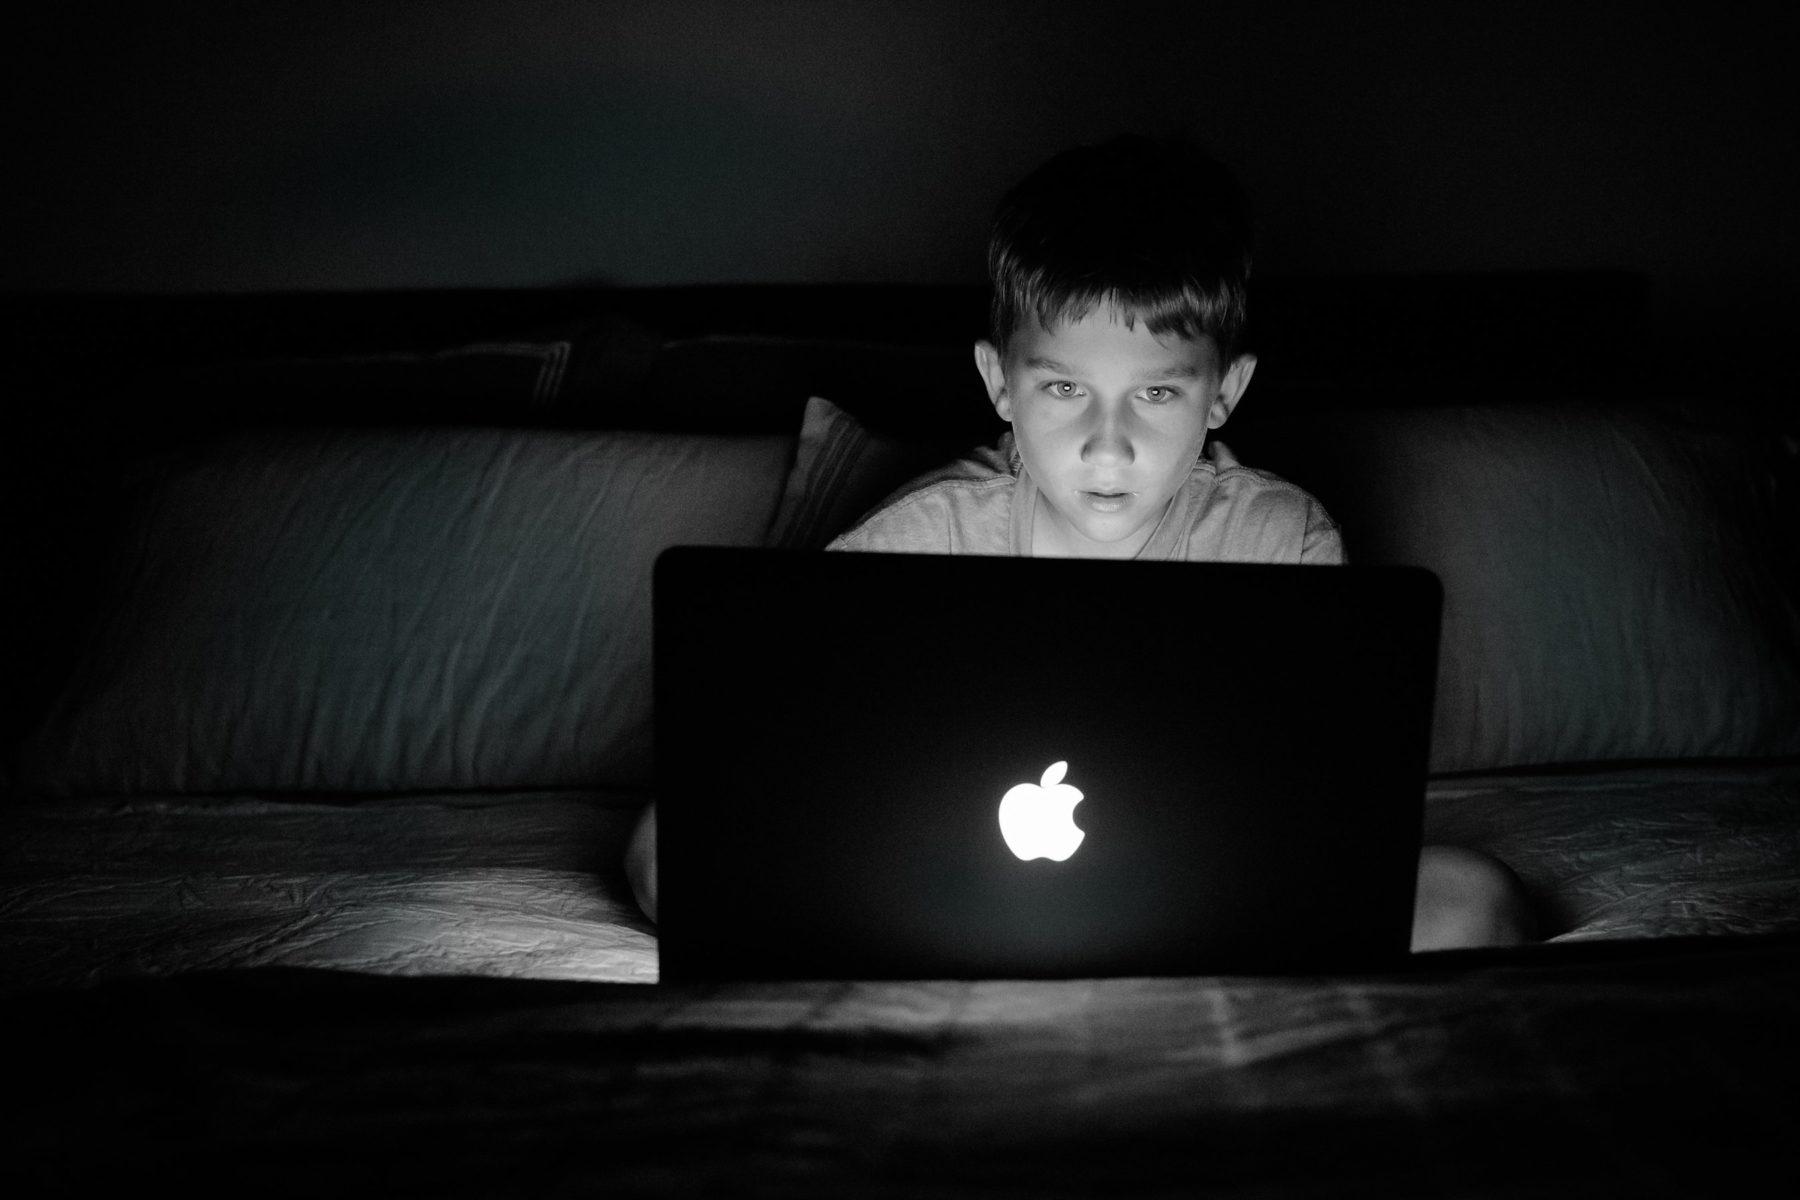 boy on Apple Computer